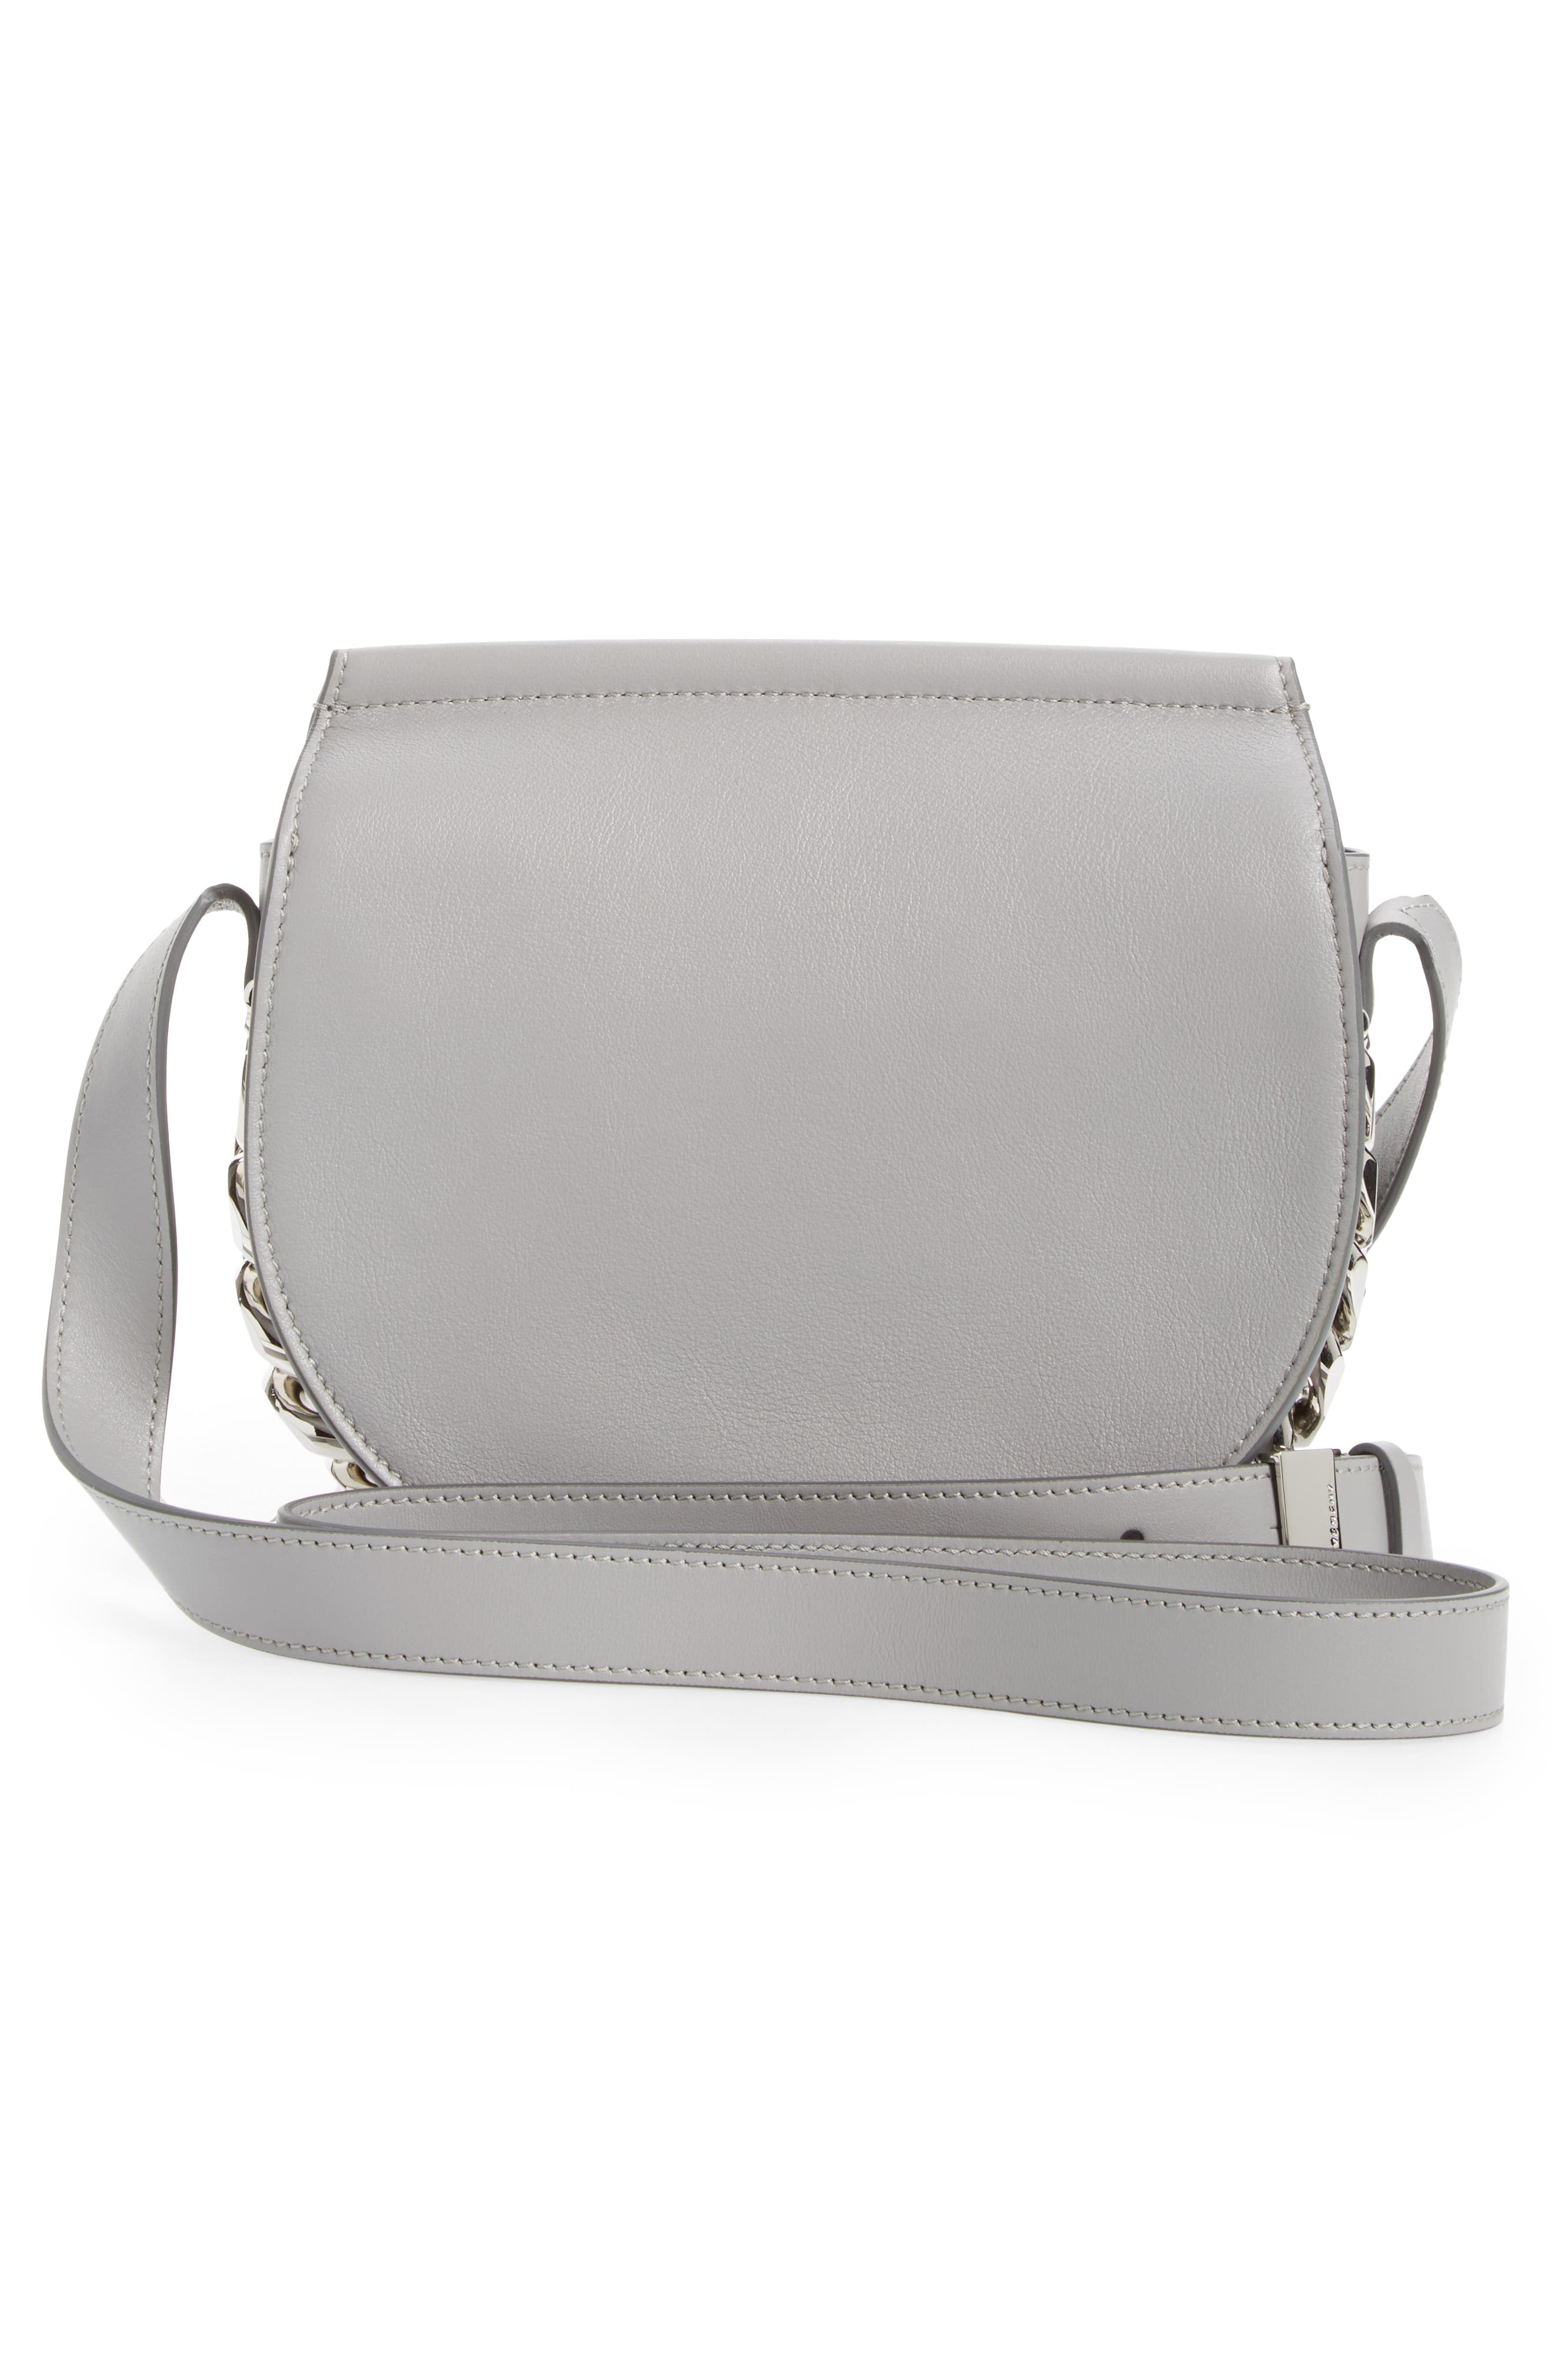 Alternate Image 3  - Givenchy Mini Infinity Calfskin Leather Saddle Bag